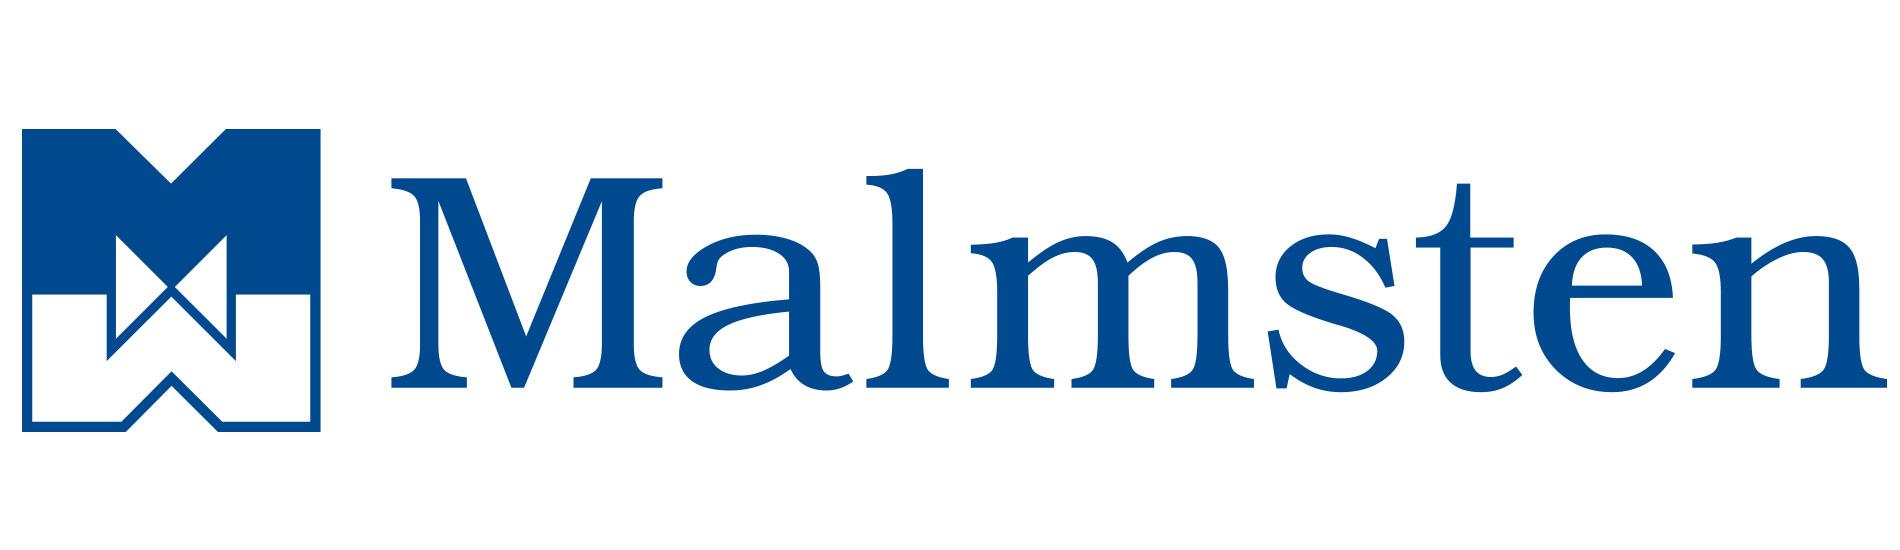 Malmsten – WWPCA's new sponsor